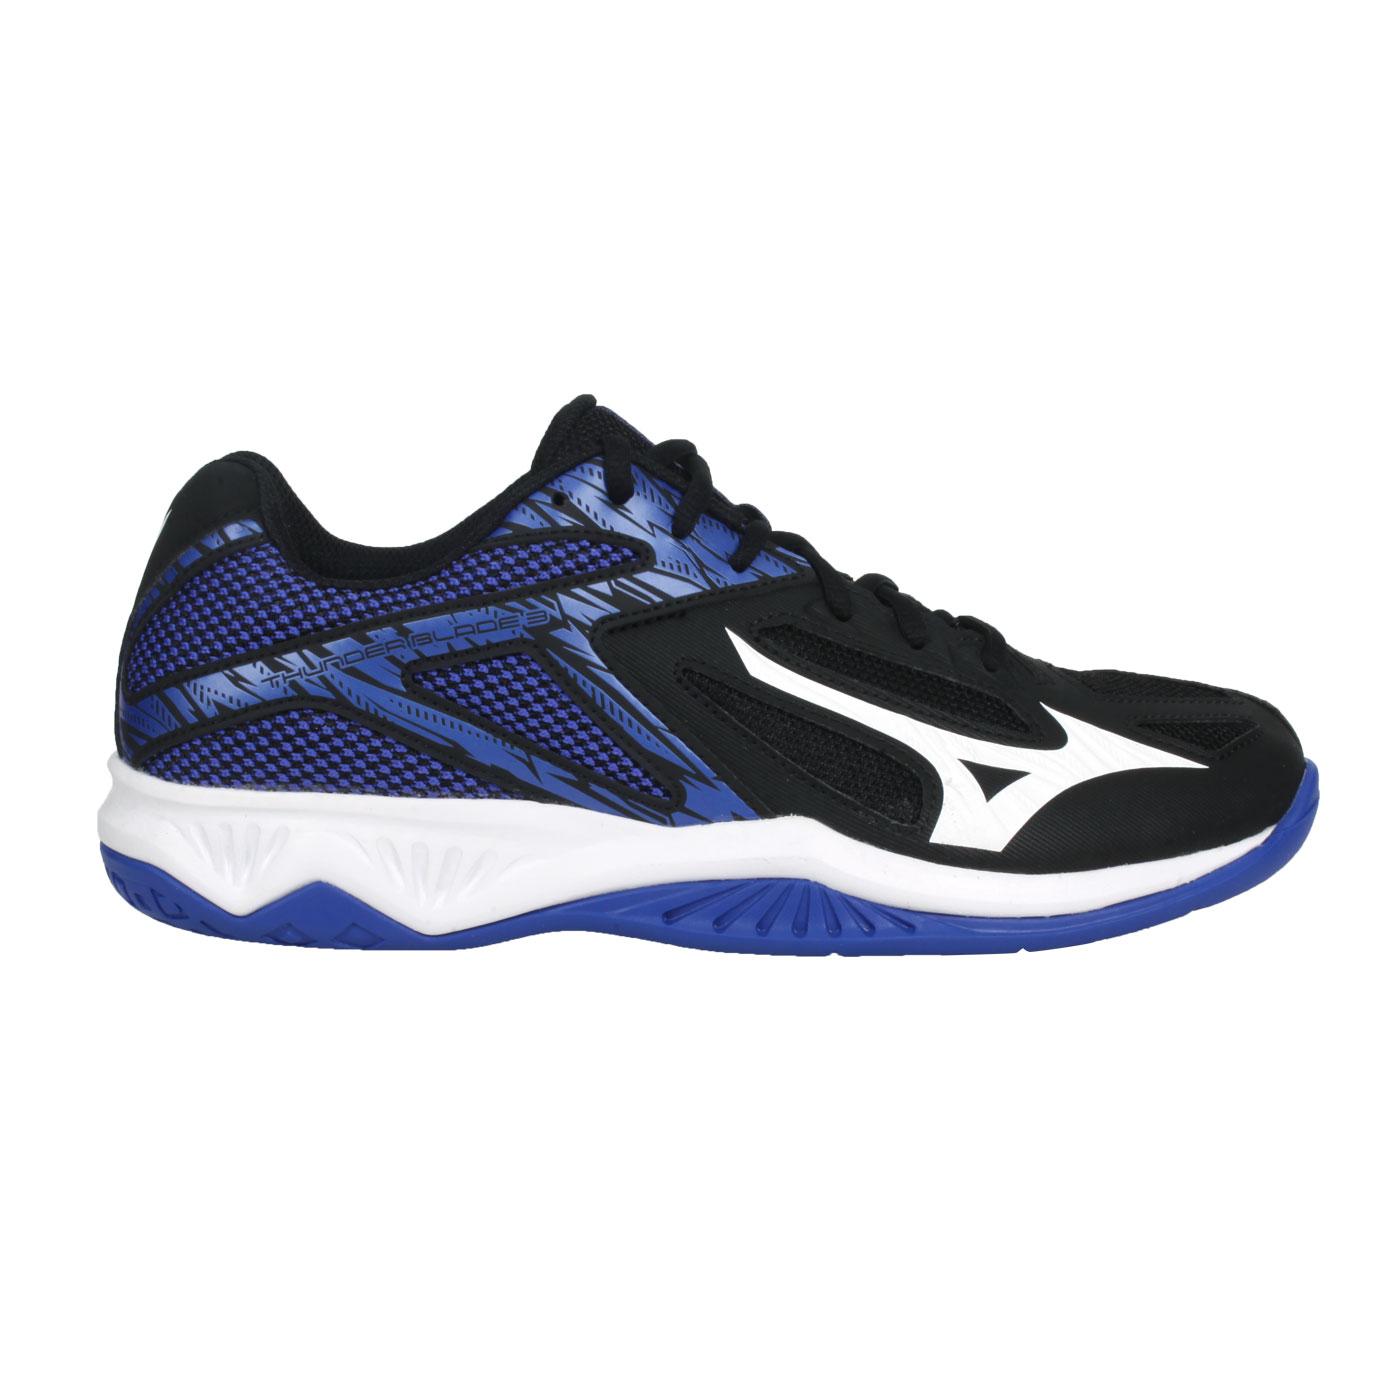 MIZUNO 排球鞋  @THUNDER BLADE 3@V1GA217003